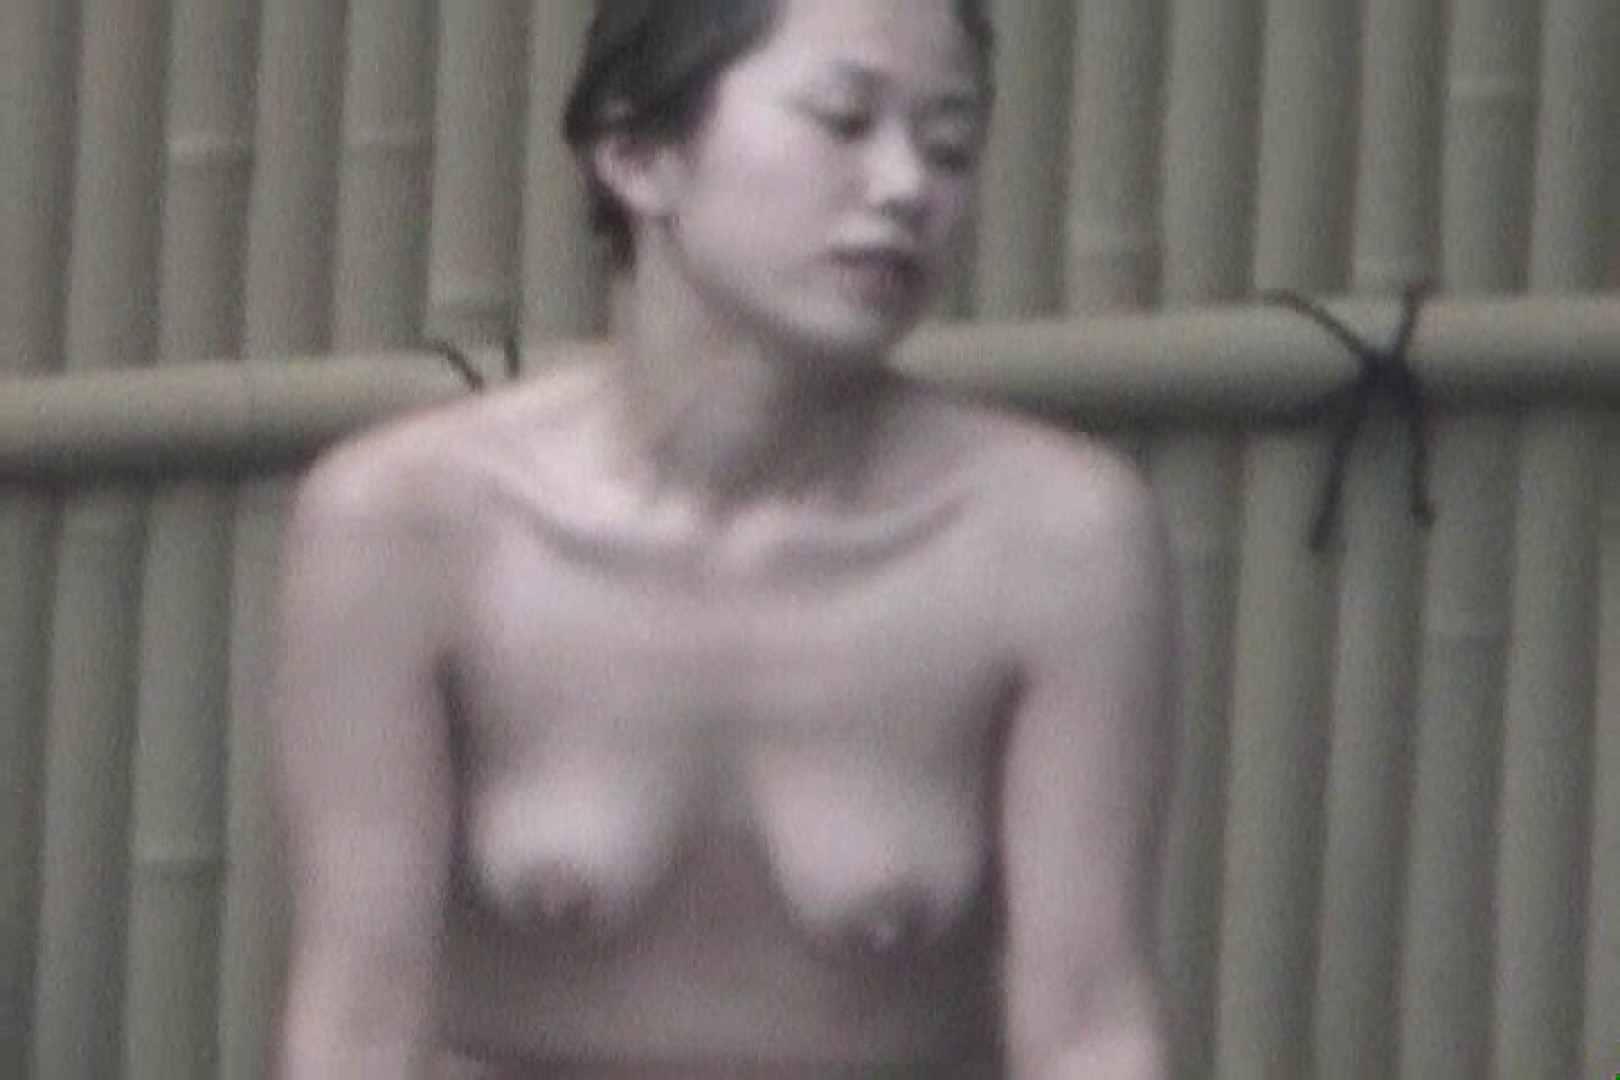 Aquaな露天風呂Vol.555 OLセックス 盗撮オメコ無修正動画無料 100画像 92